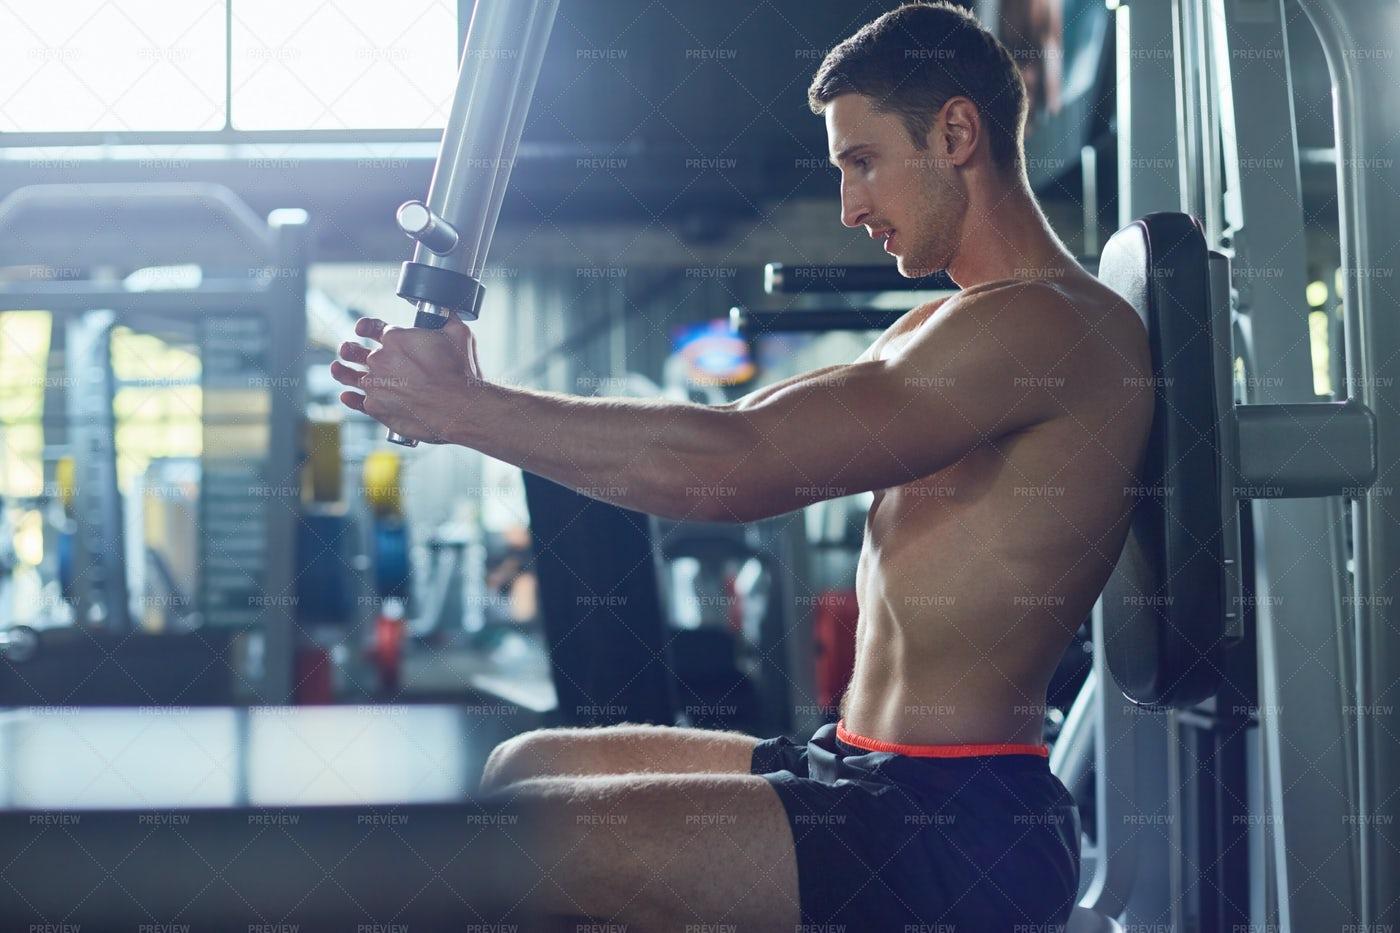 Training Upper Body At Gym: Stock Photos